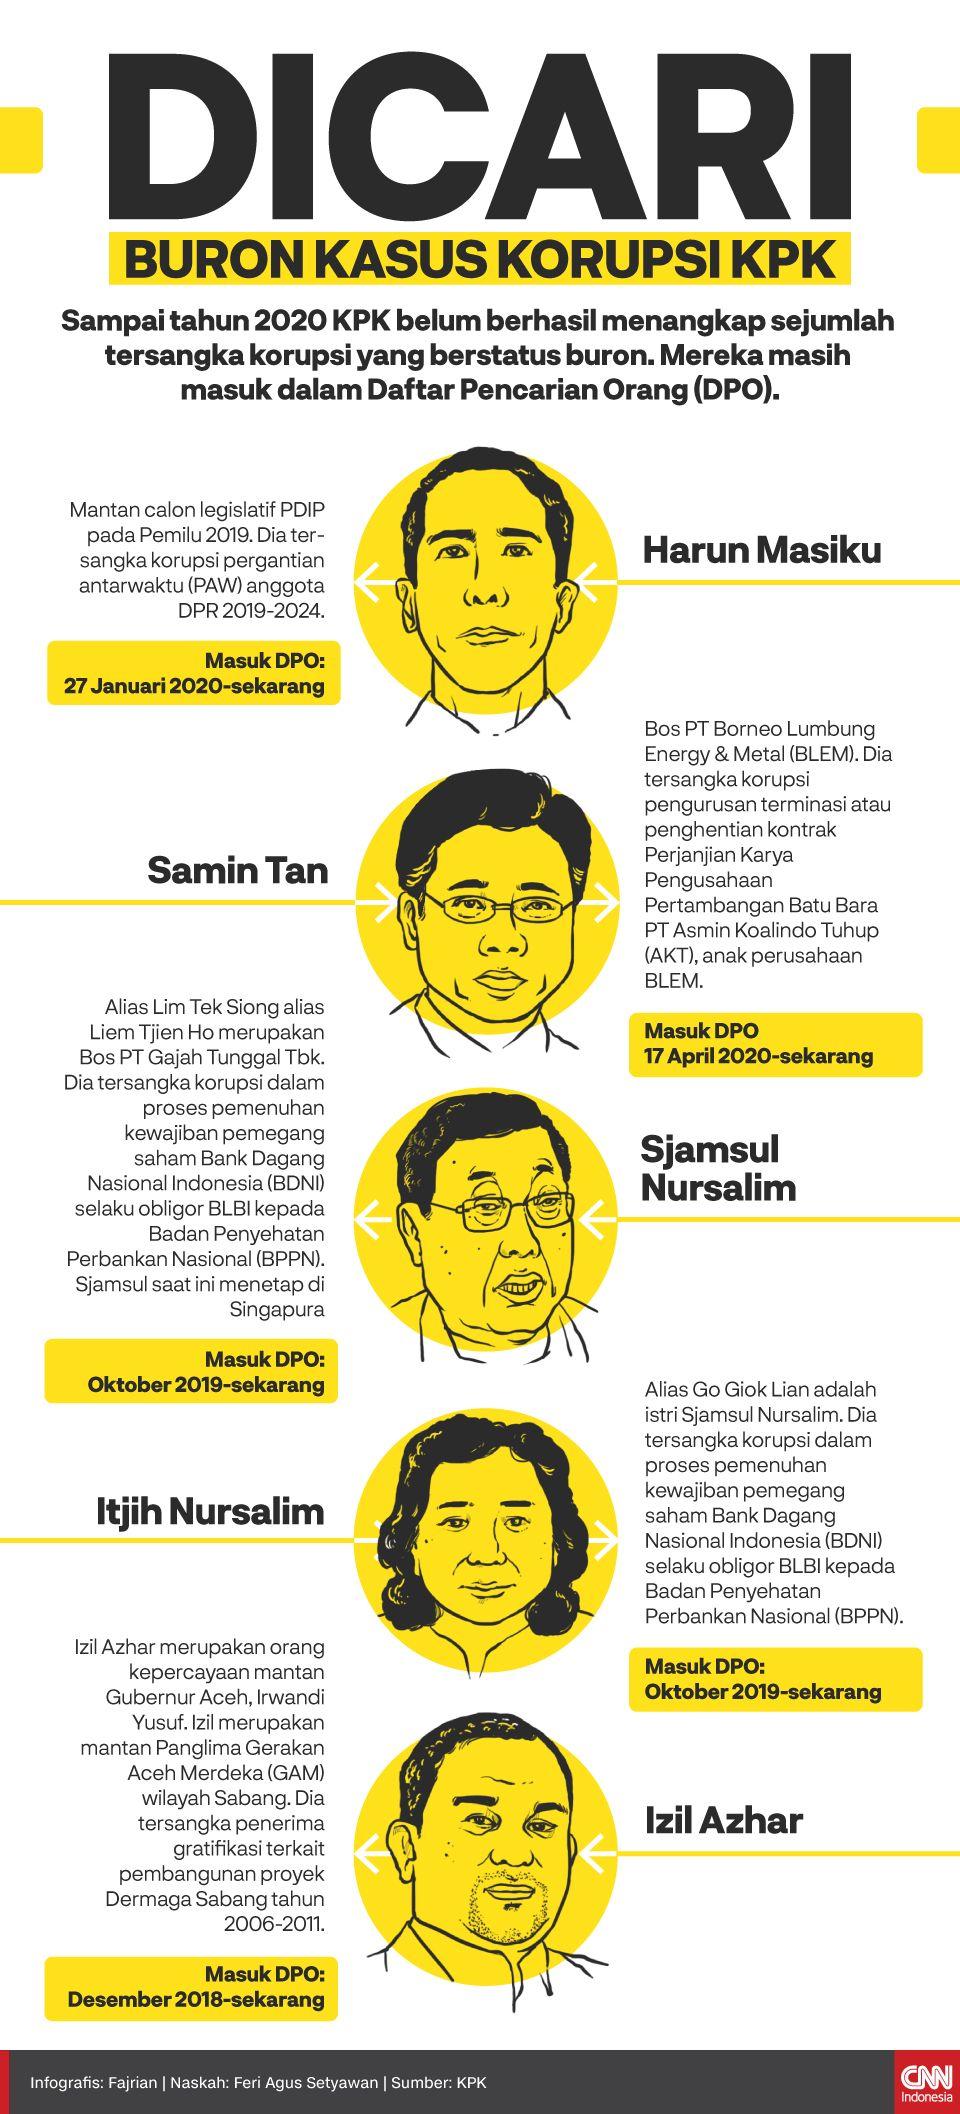 Infografis Dicari Buron Kasus Korupsi KPK